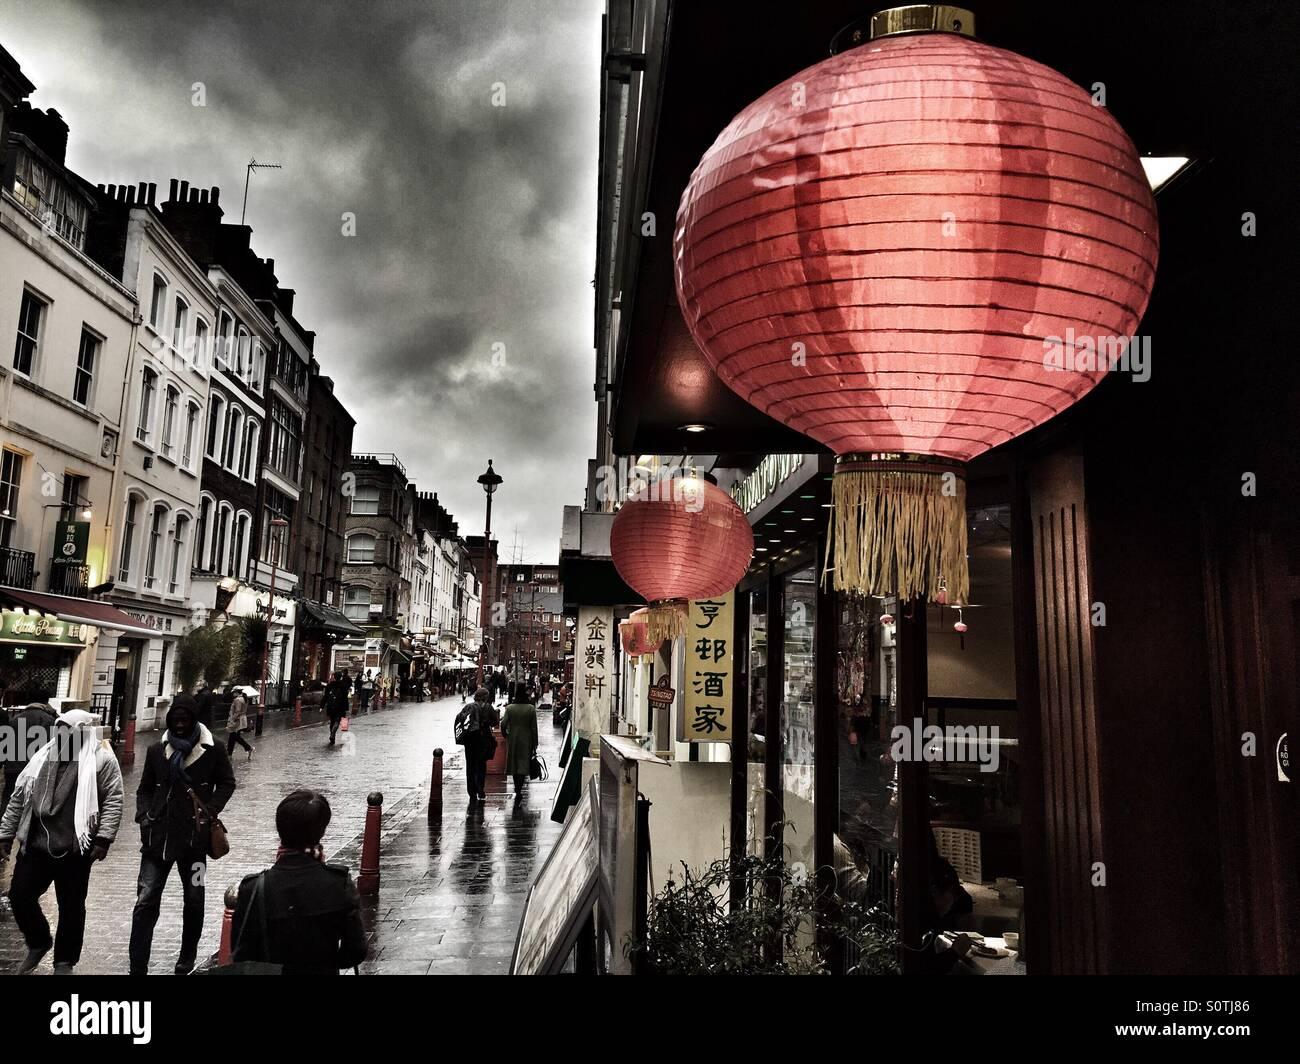 China Town, London. - Stock Image